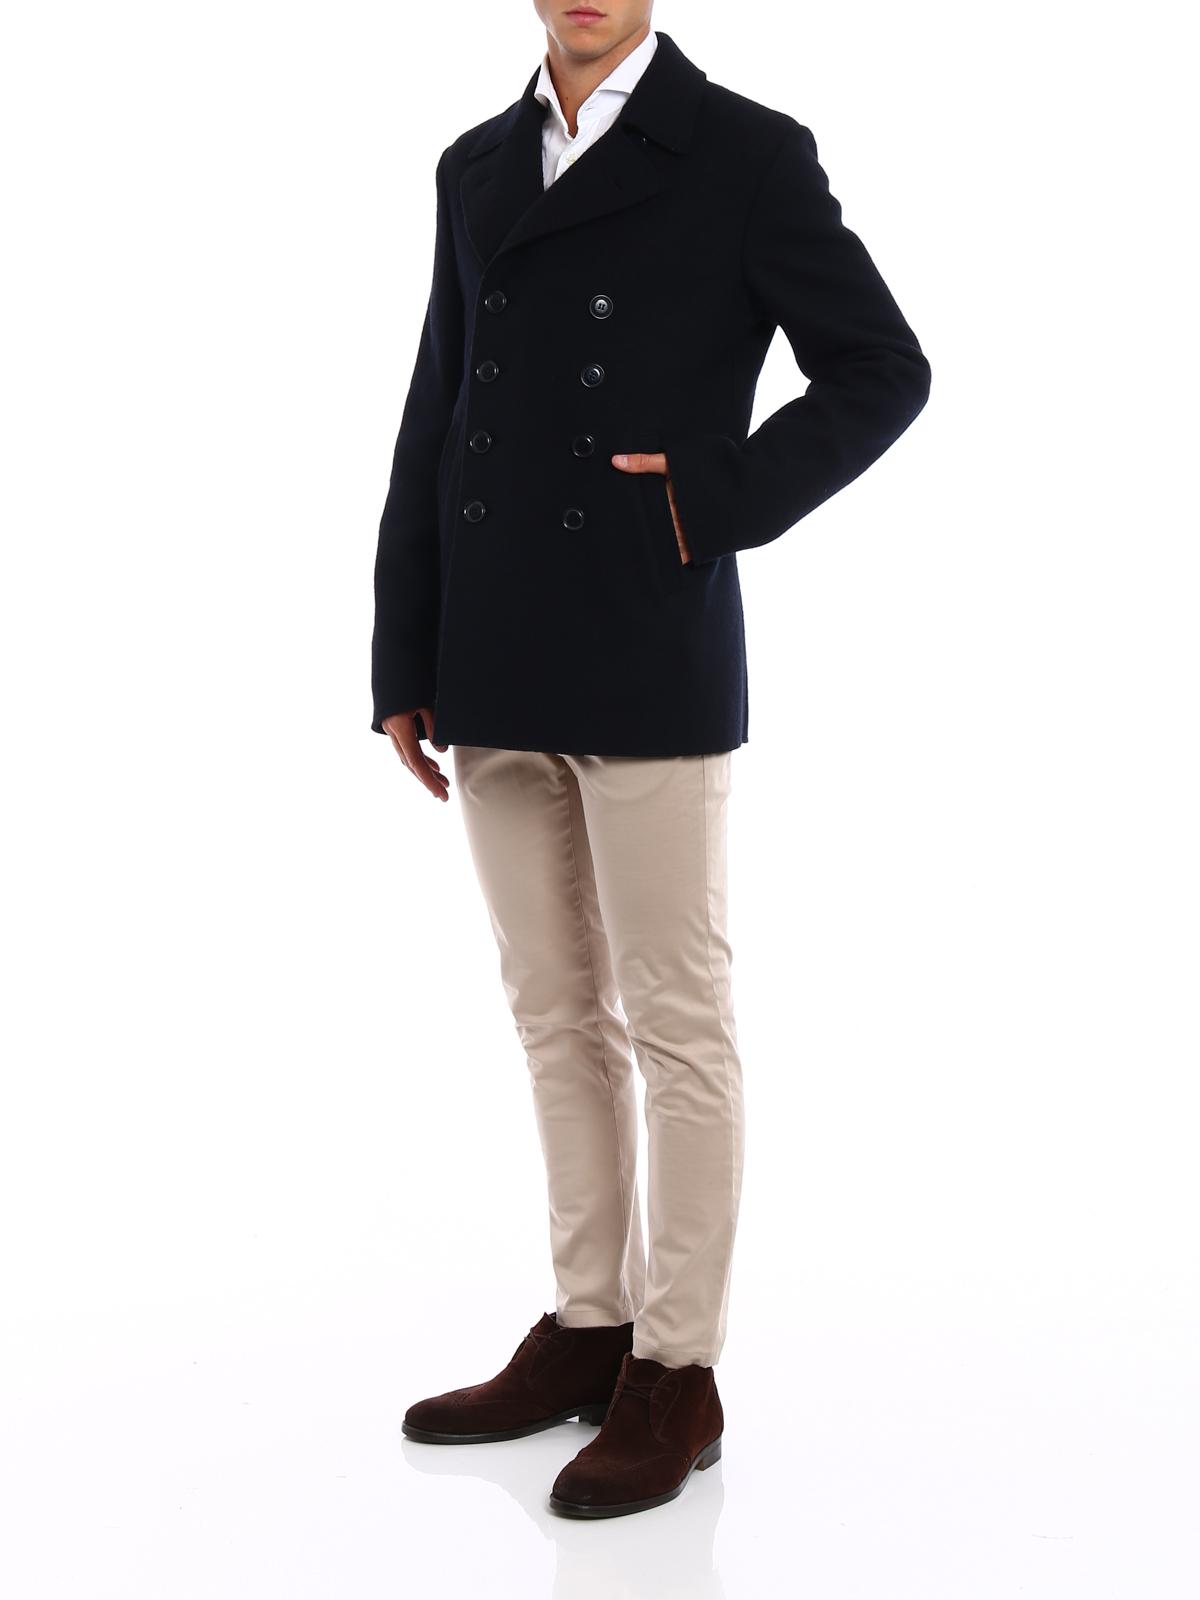 Aspesi Caban in lana cotta giacche casual CG29E52201098